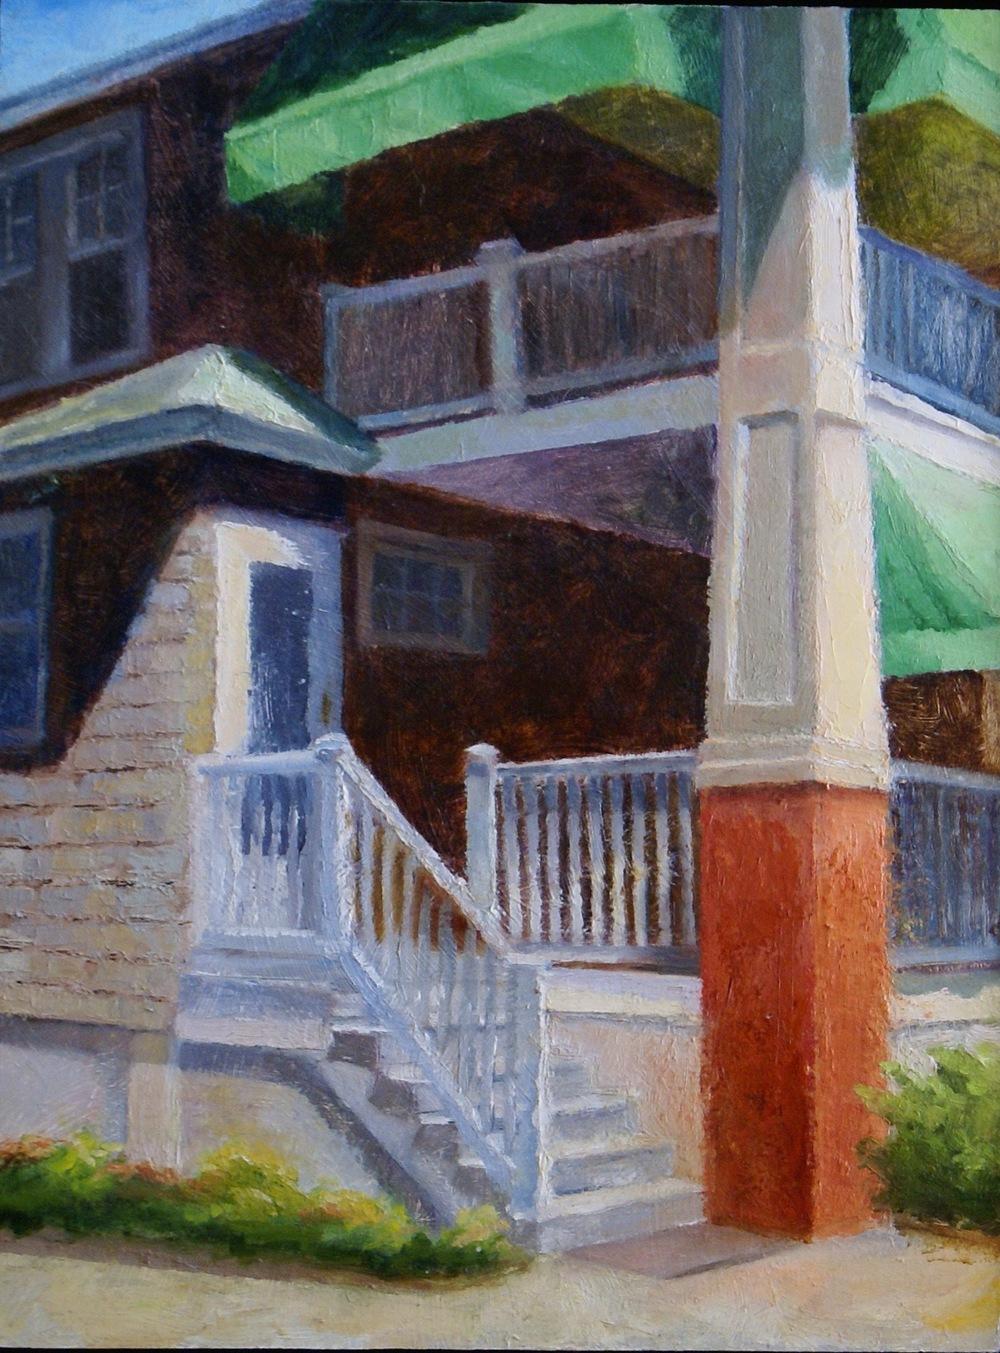 Porch and Pillar